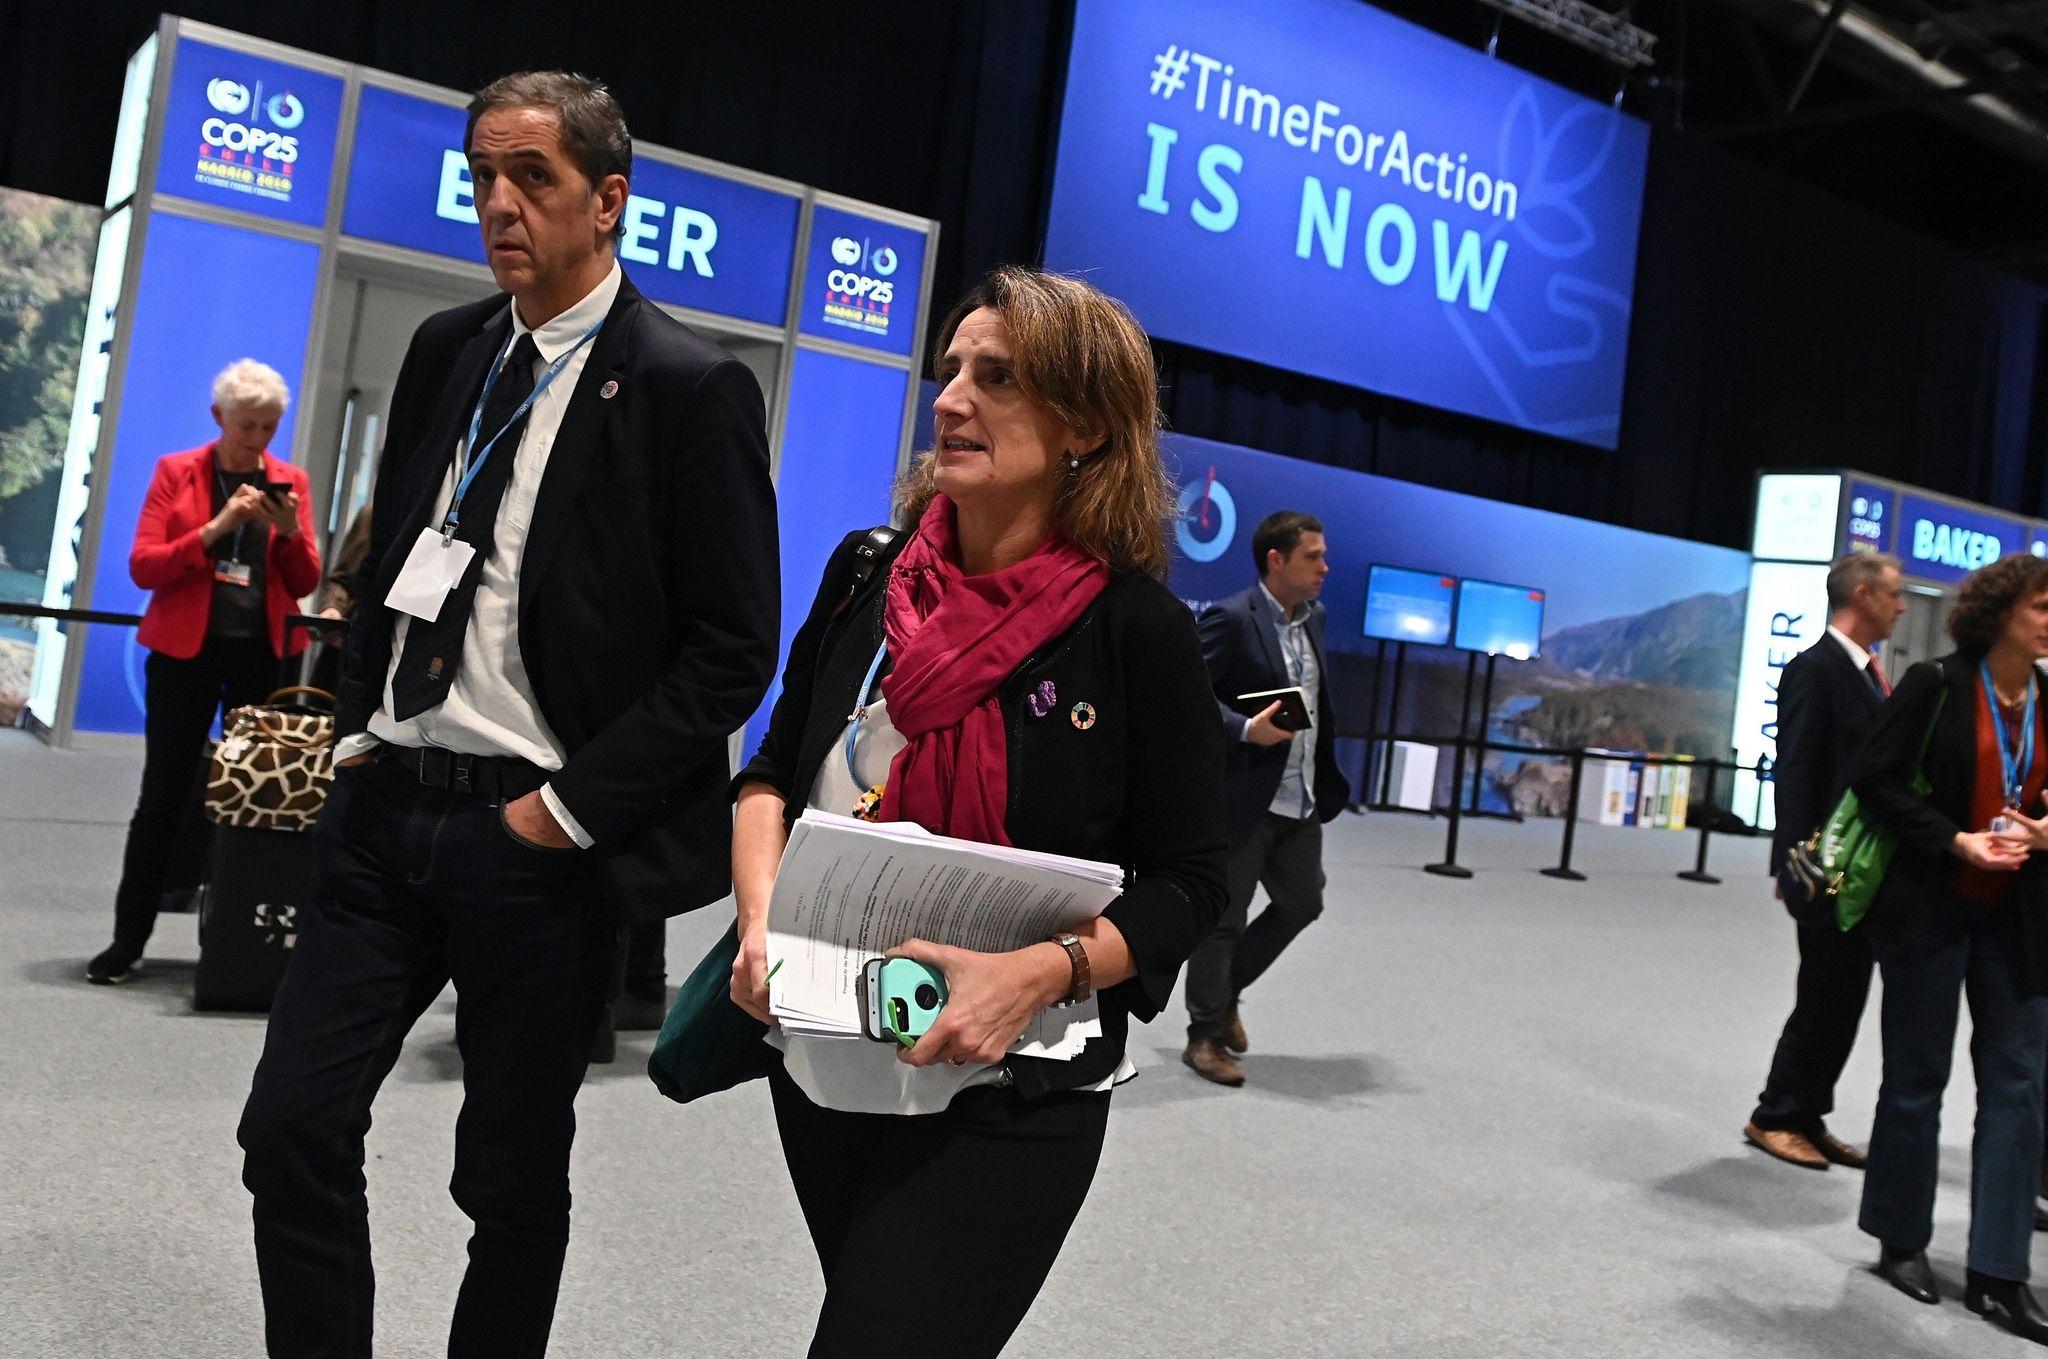 La ministra en funciones para la Transición Ecológica Teresa Ribera en la Cumbre del Clima